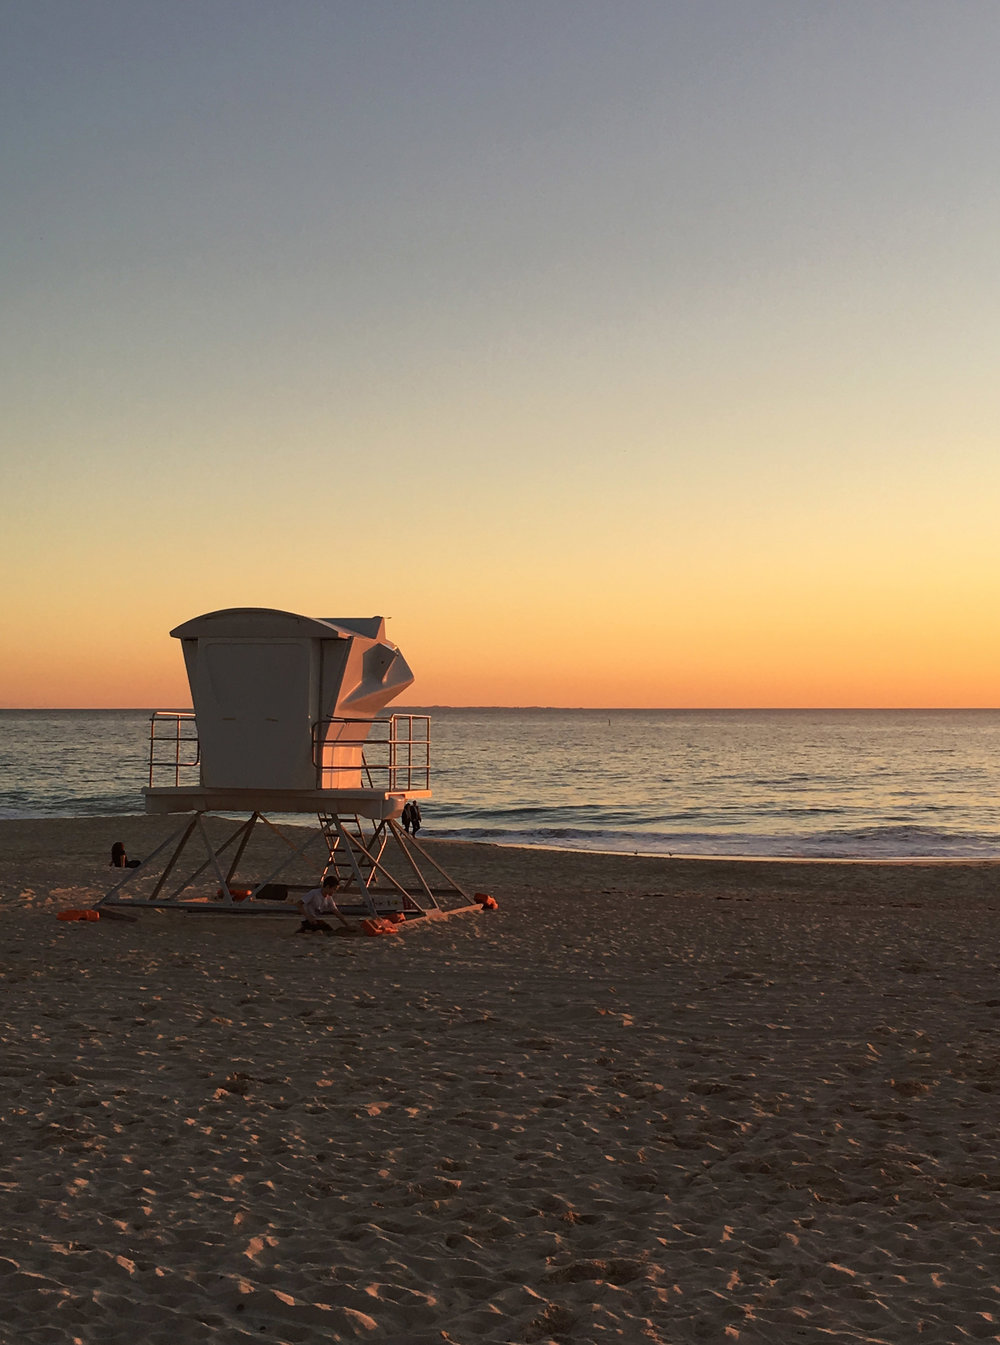 Lozidaze_Perth-City-Beach_01